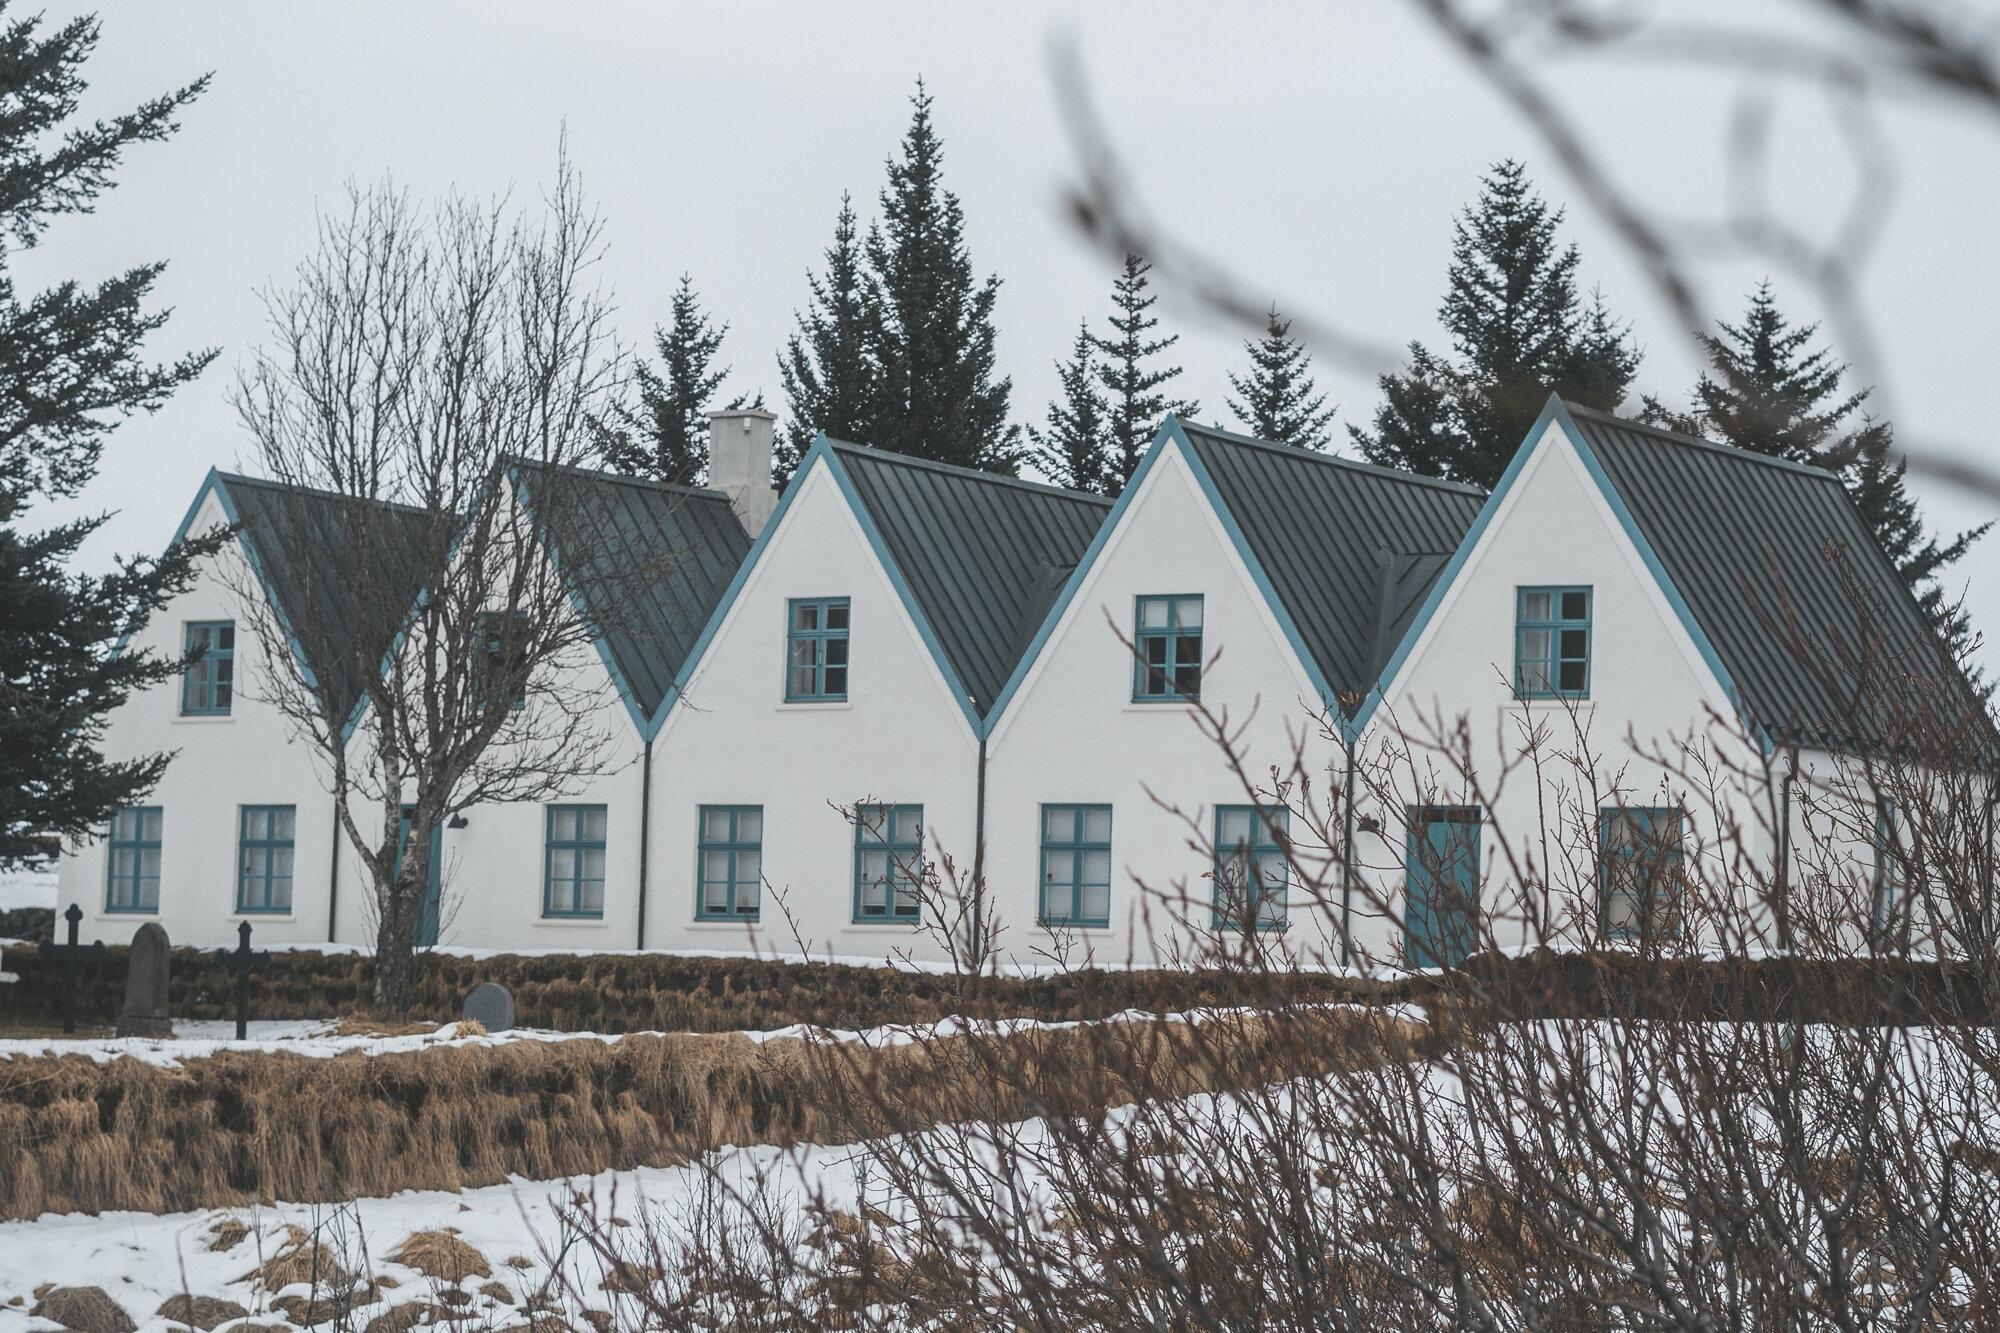 Thingvellir国家公园的一排冰岛房屋,前景是树木和树枝